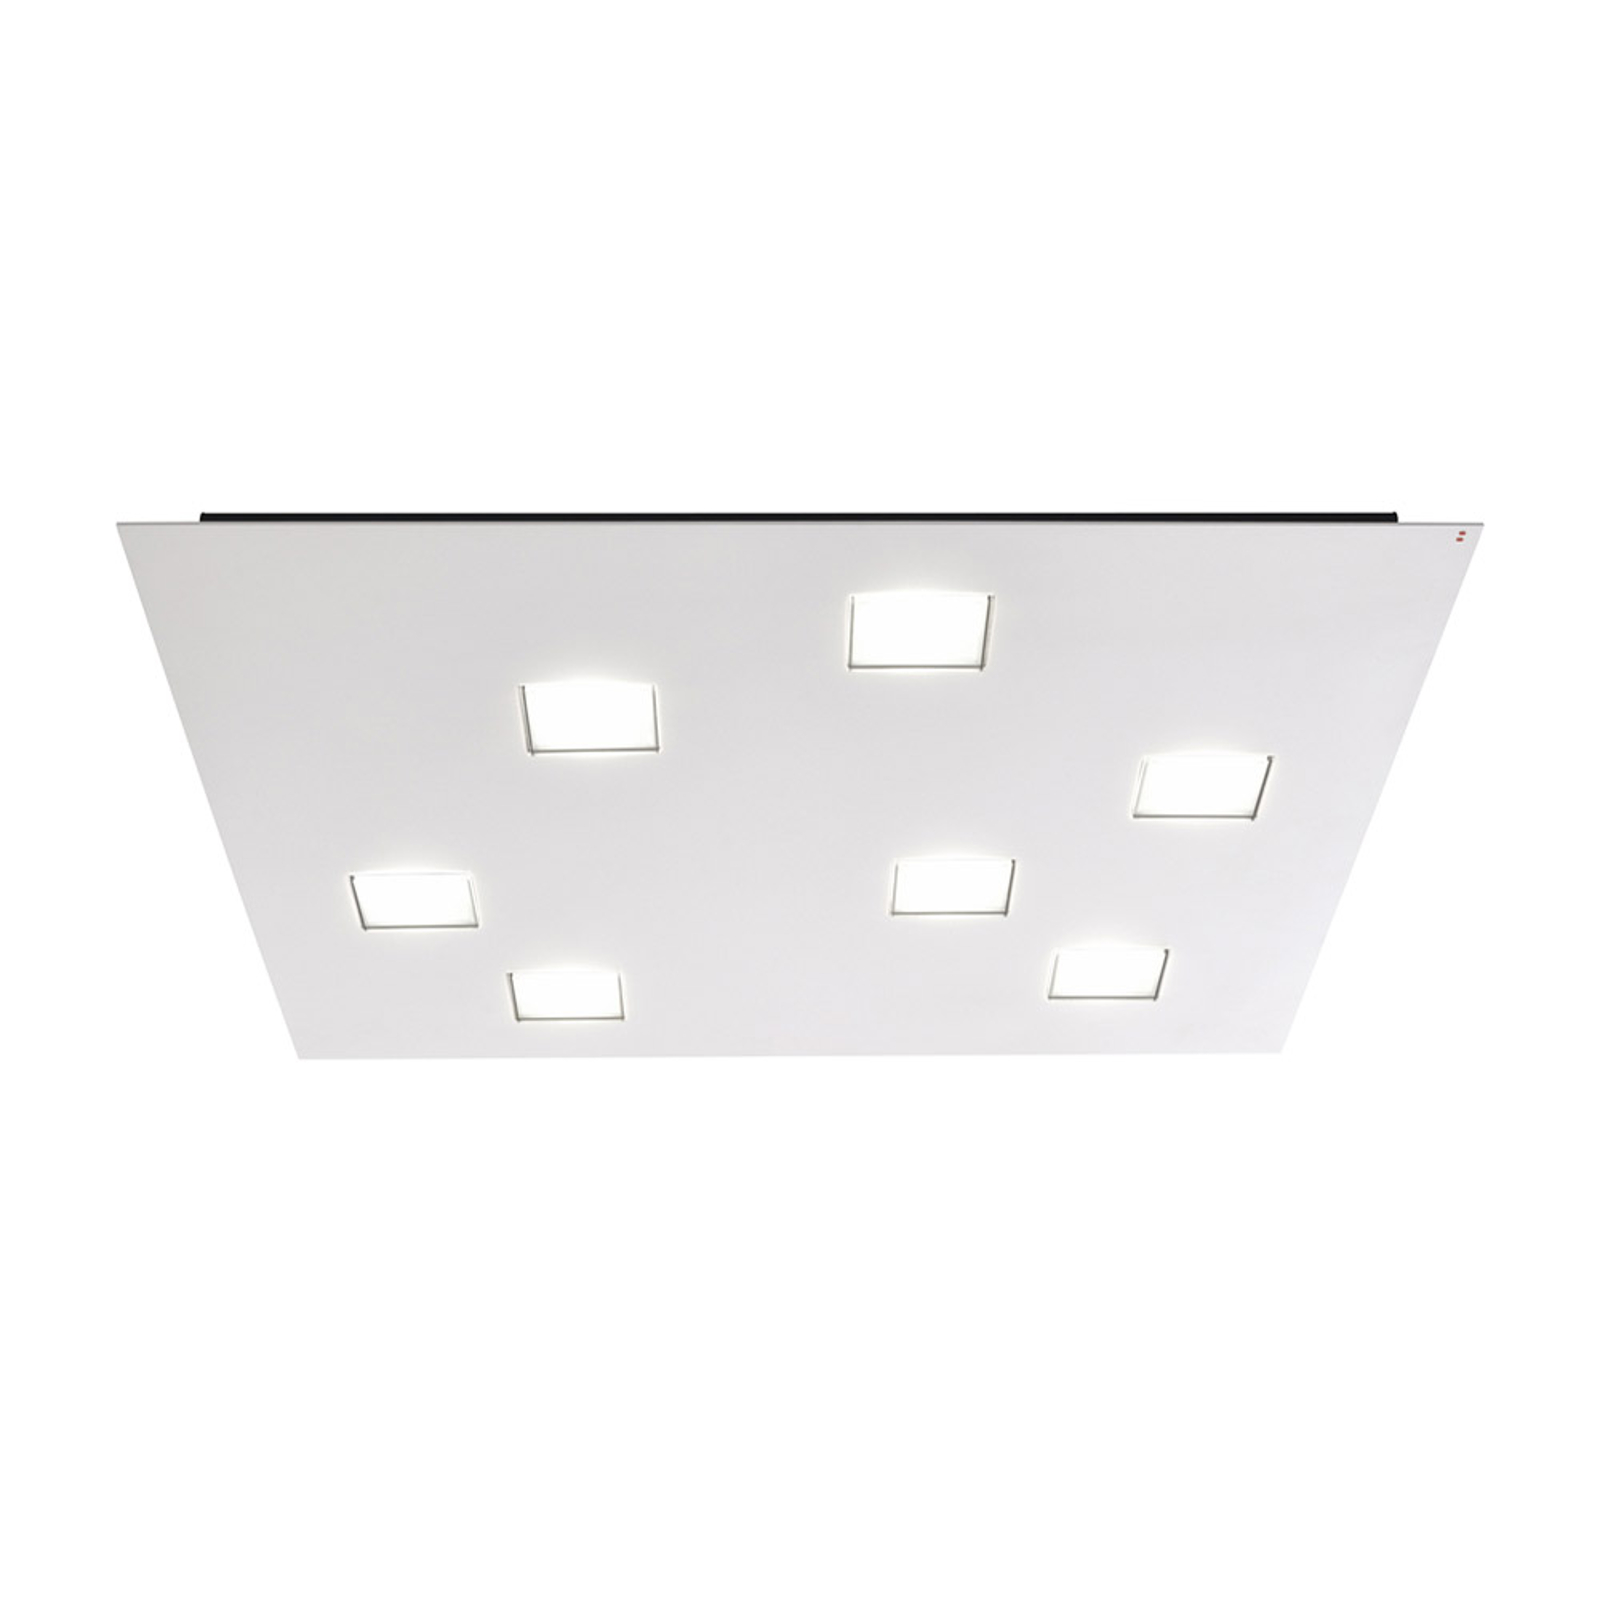 Fabbian Quarter - weiße LED-Deckenlampe 7flg.